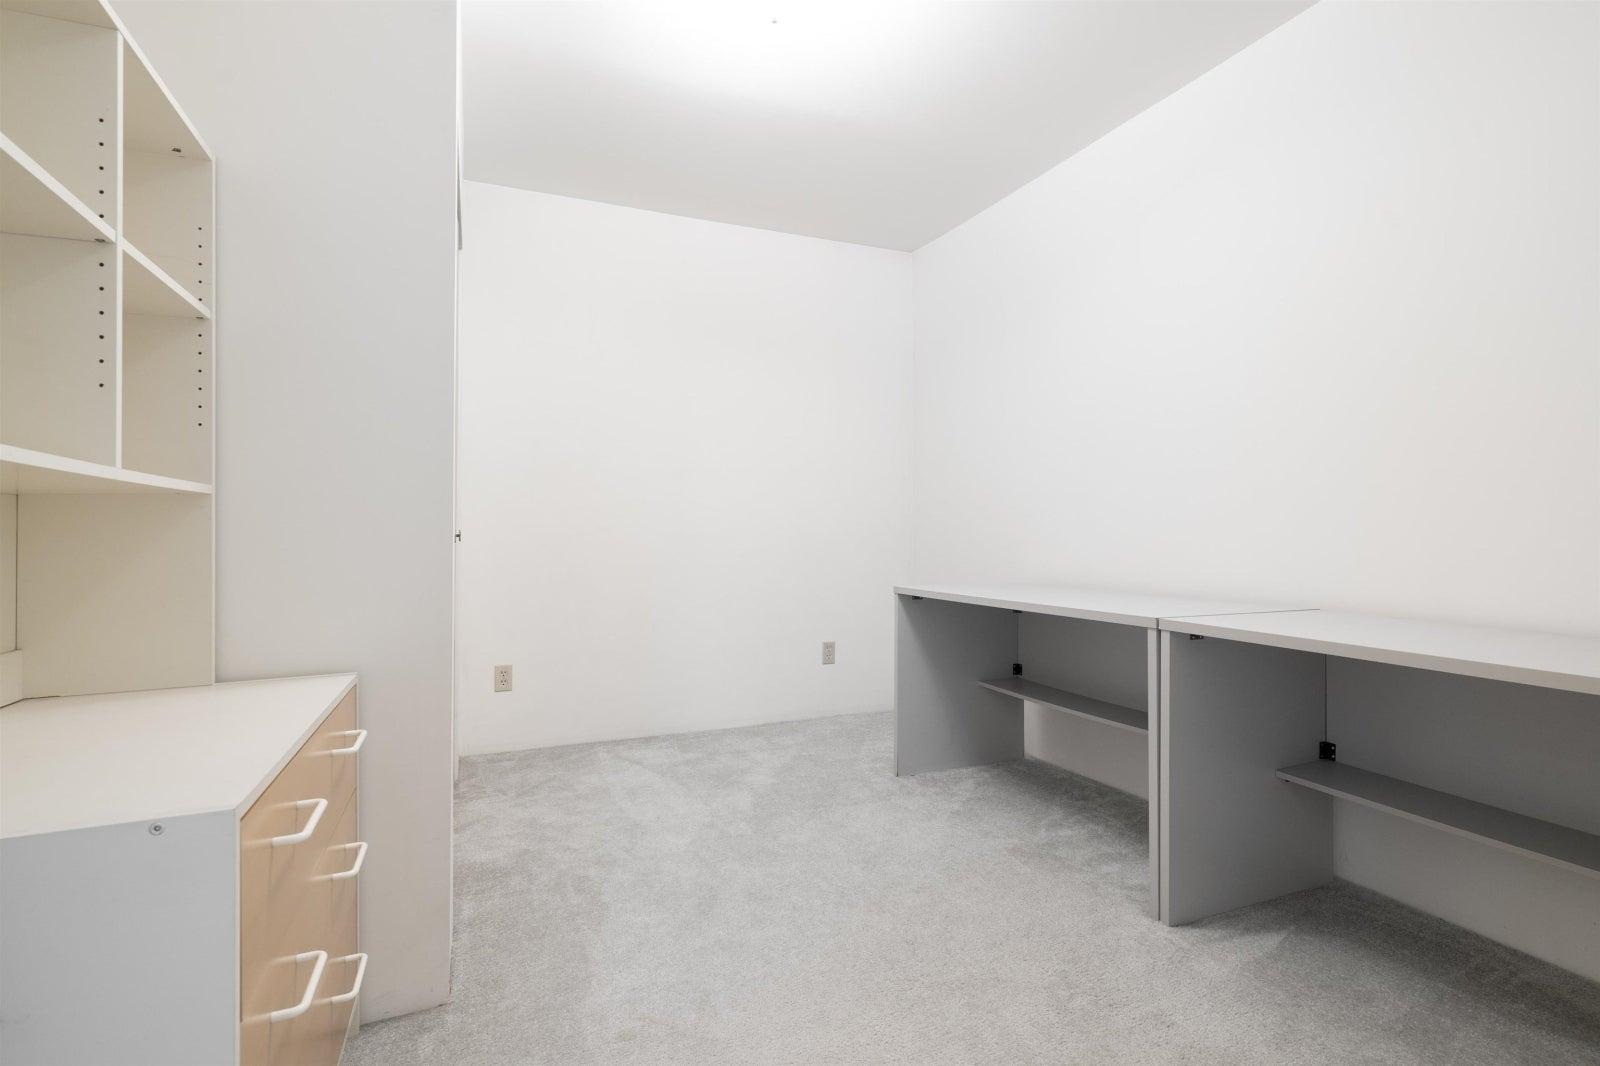 2556 RAVEN COURT - Eagle Ridge CQ House/Single Family for sale, 4 Bedrooms (R2611826) #31